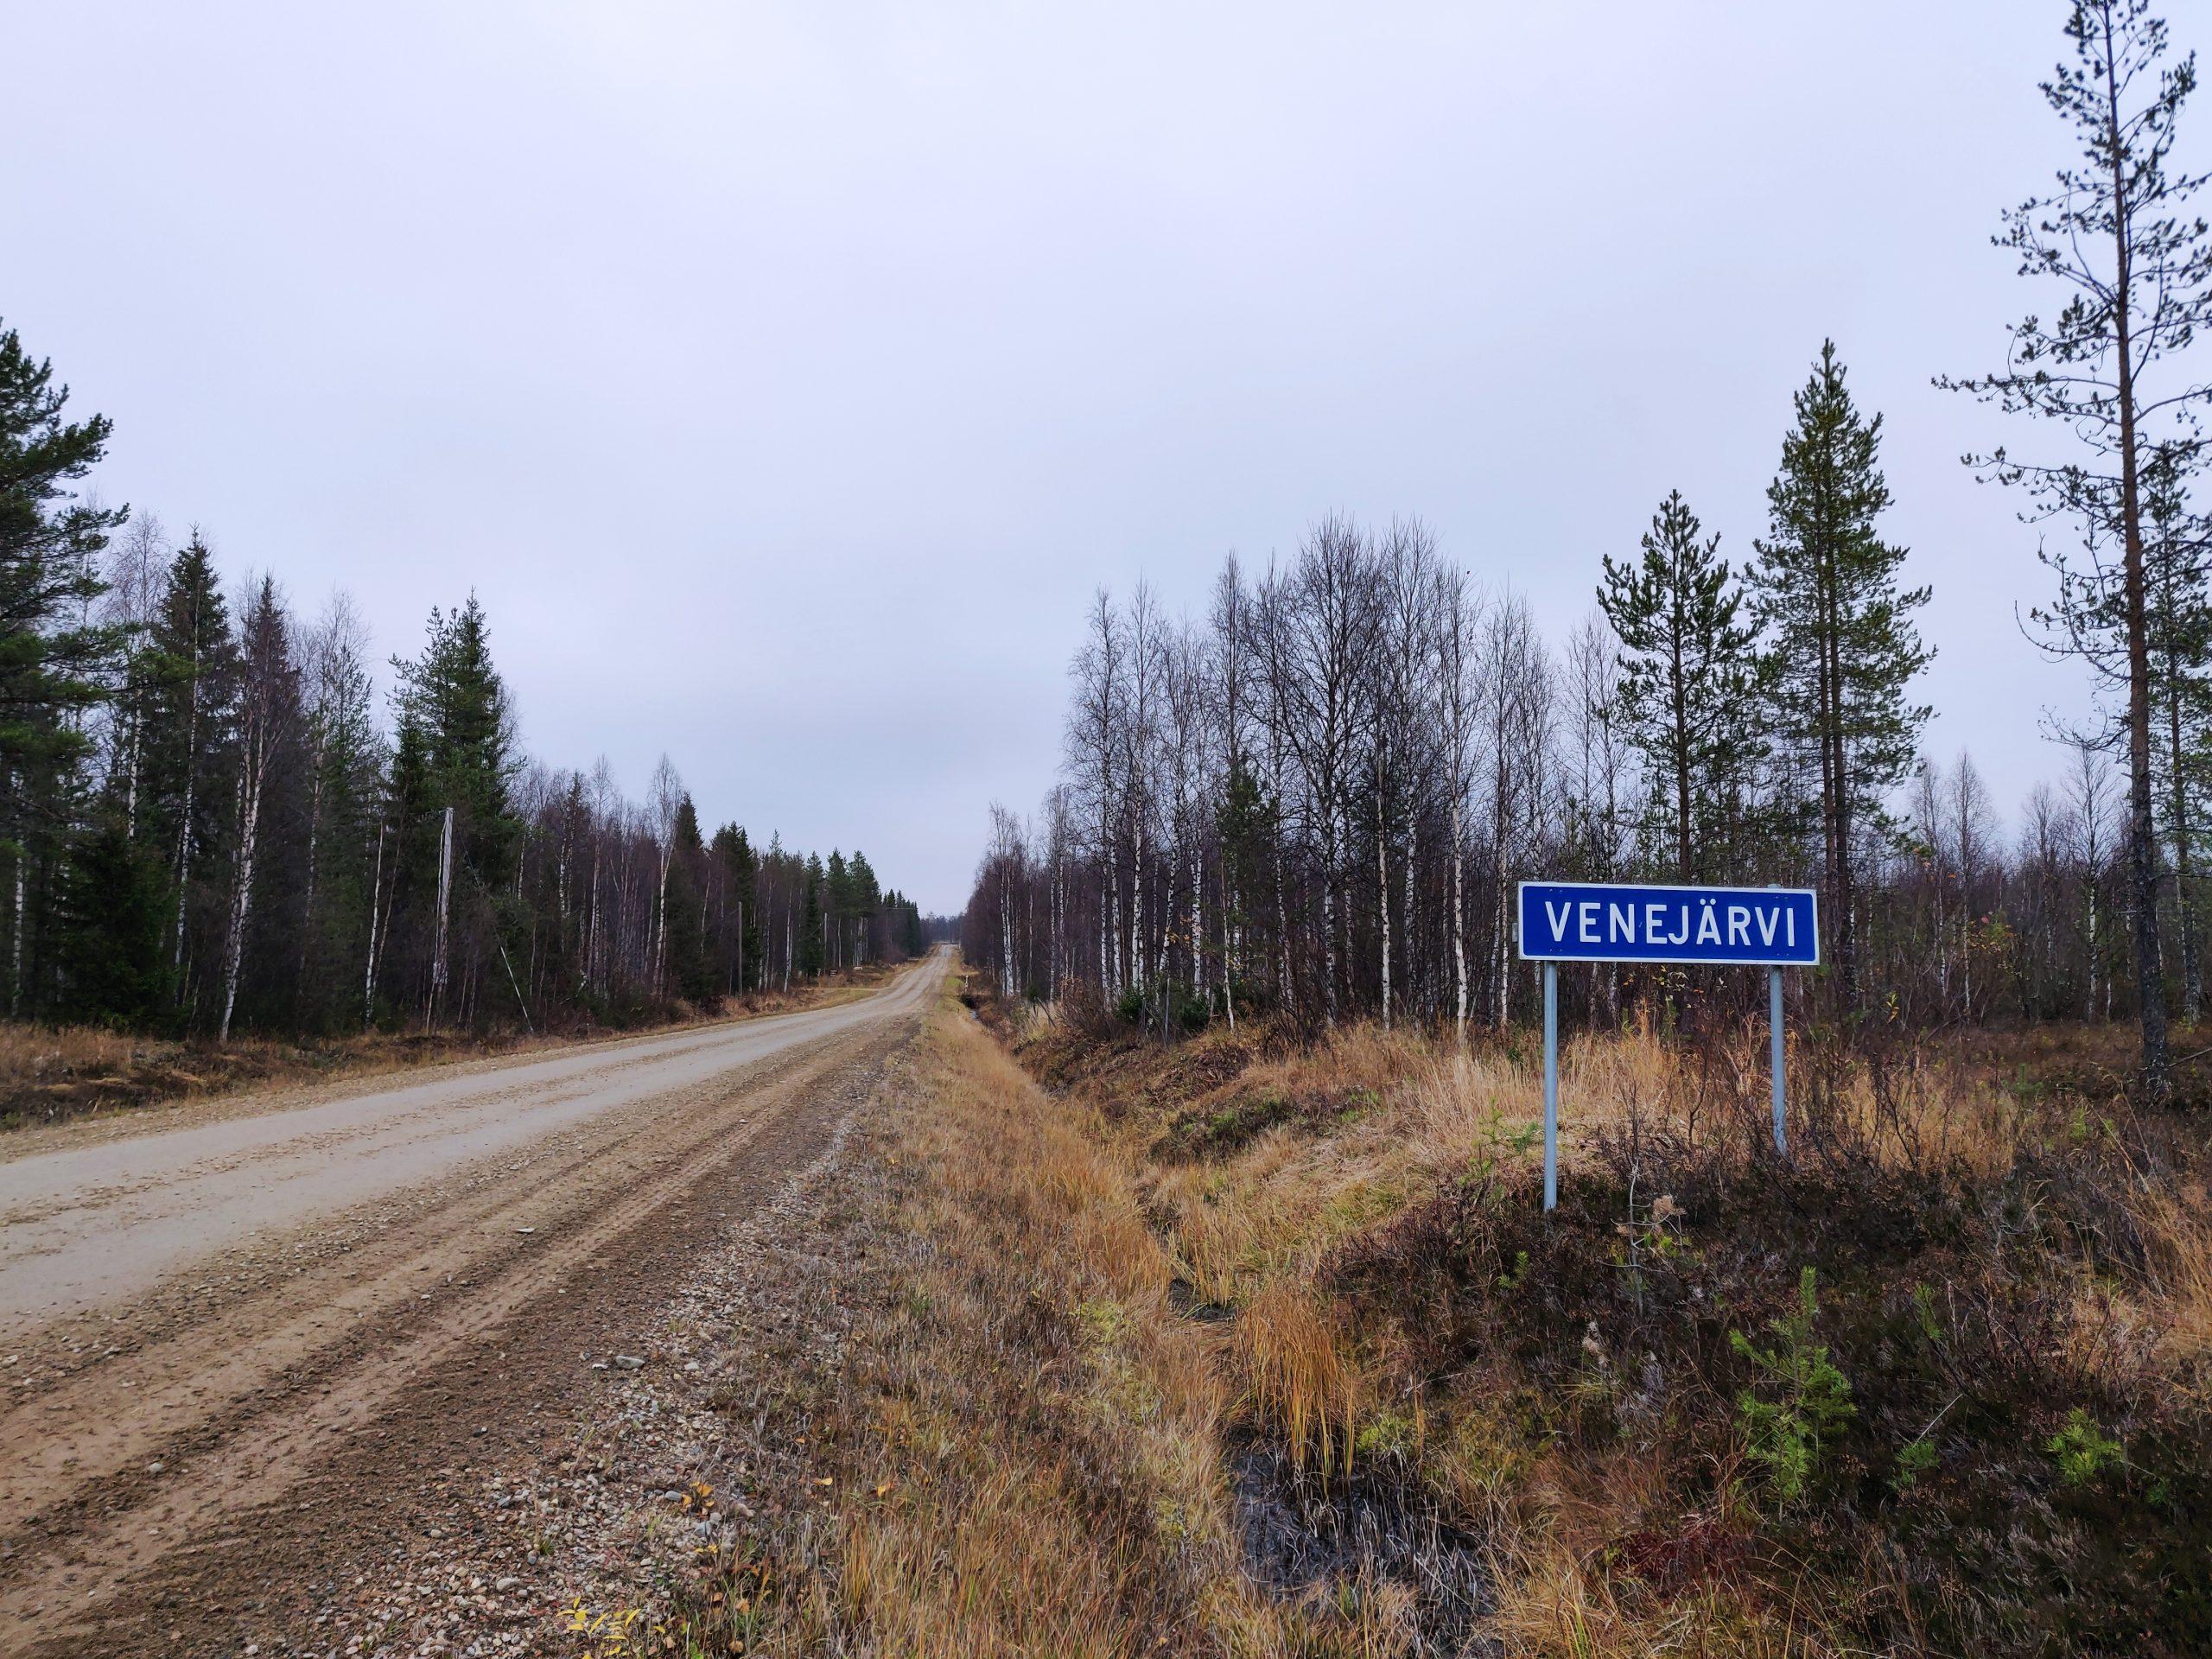 Tie Venejärvelle, tien vieressä Venejärvi-kyltti.